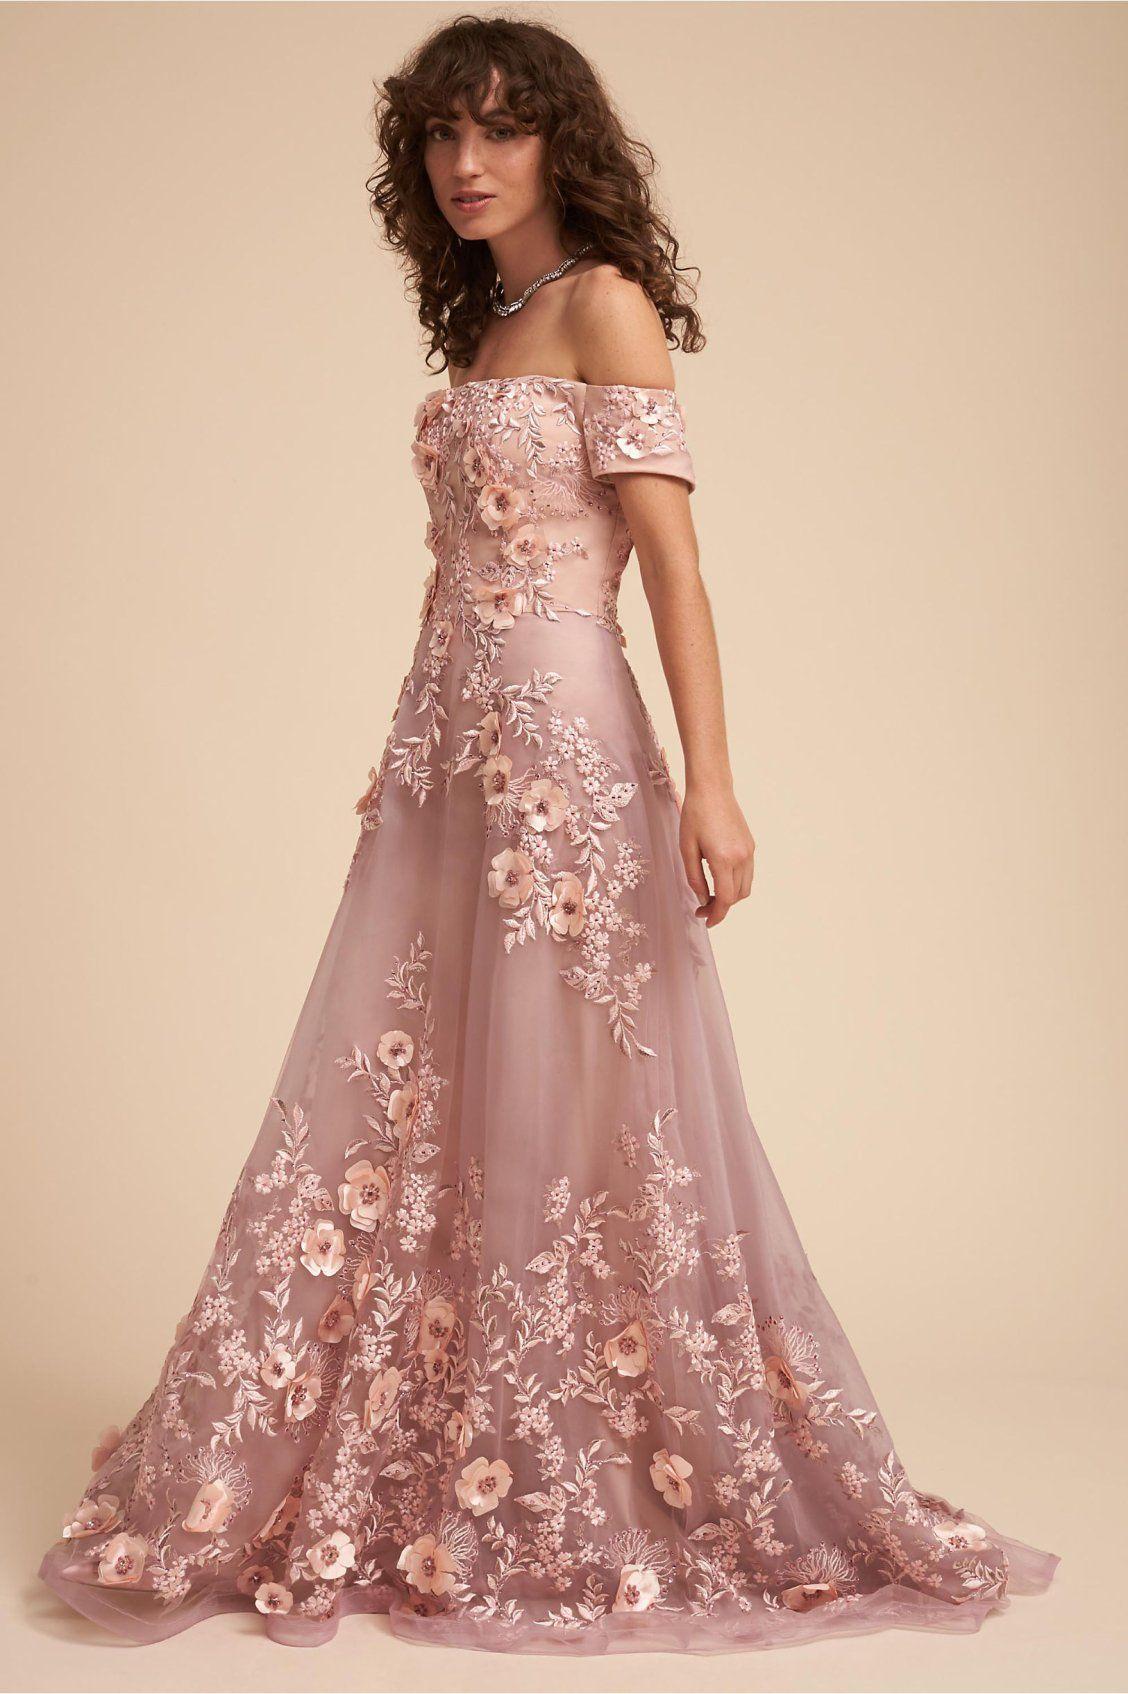 dusty rose | Vandra Dress from BHLDN | Blush Wedding Ideas ...